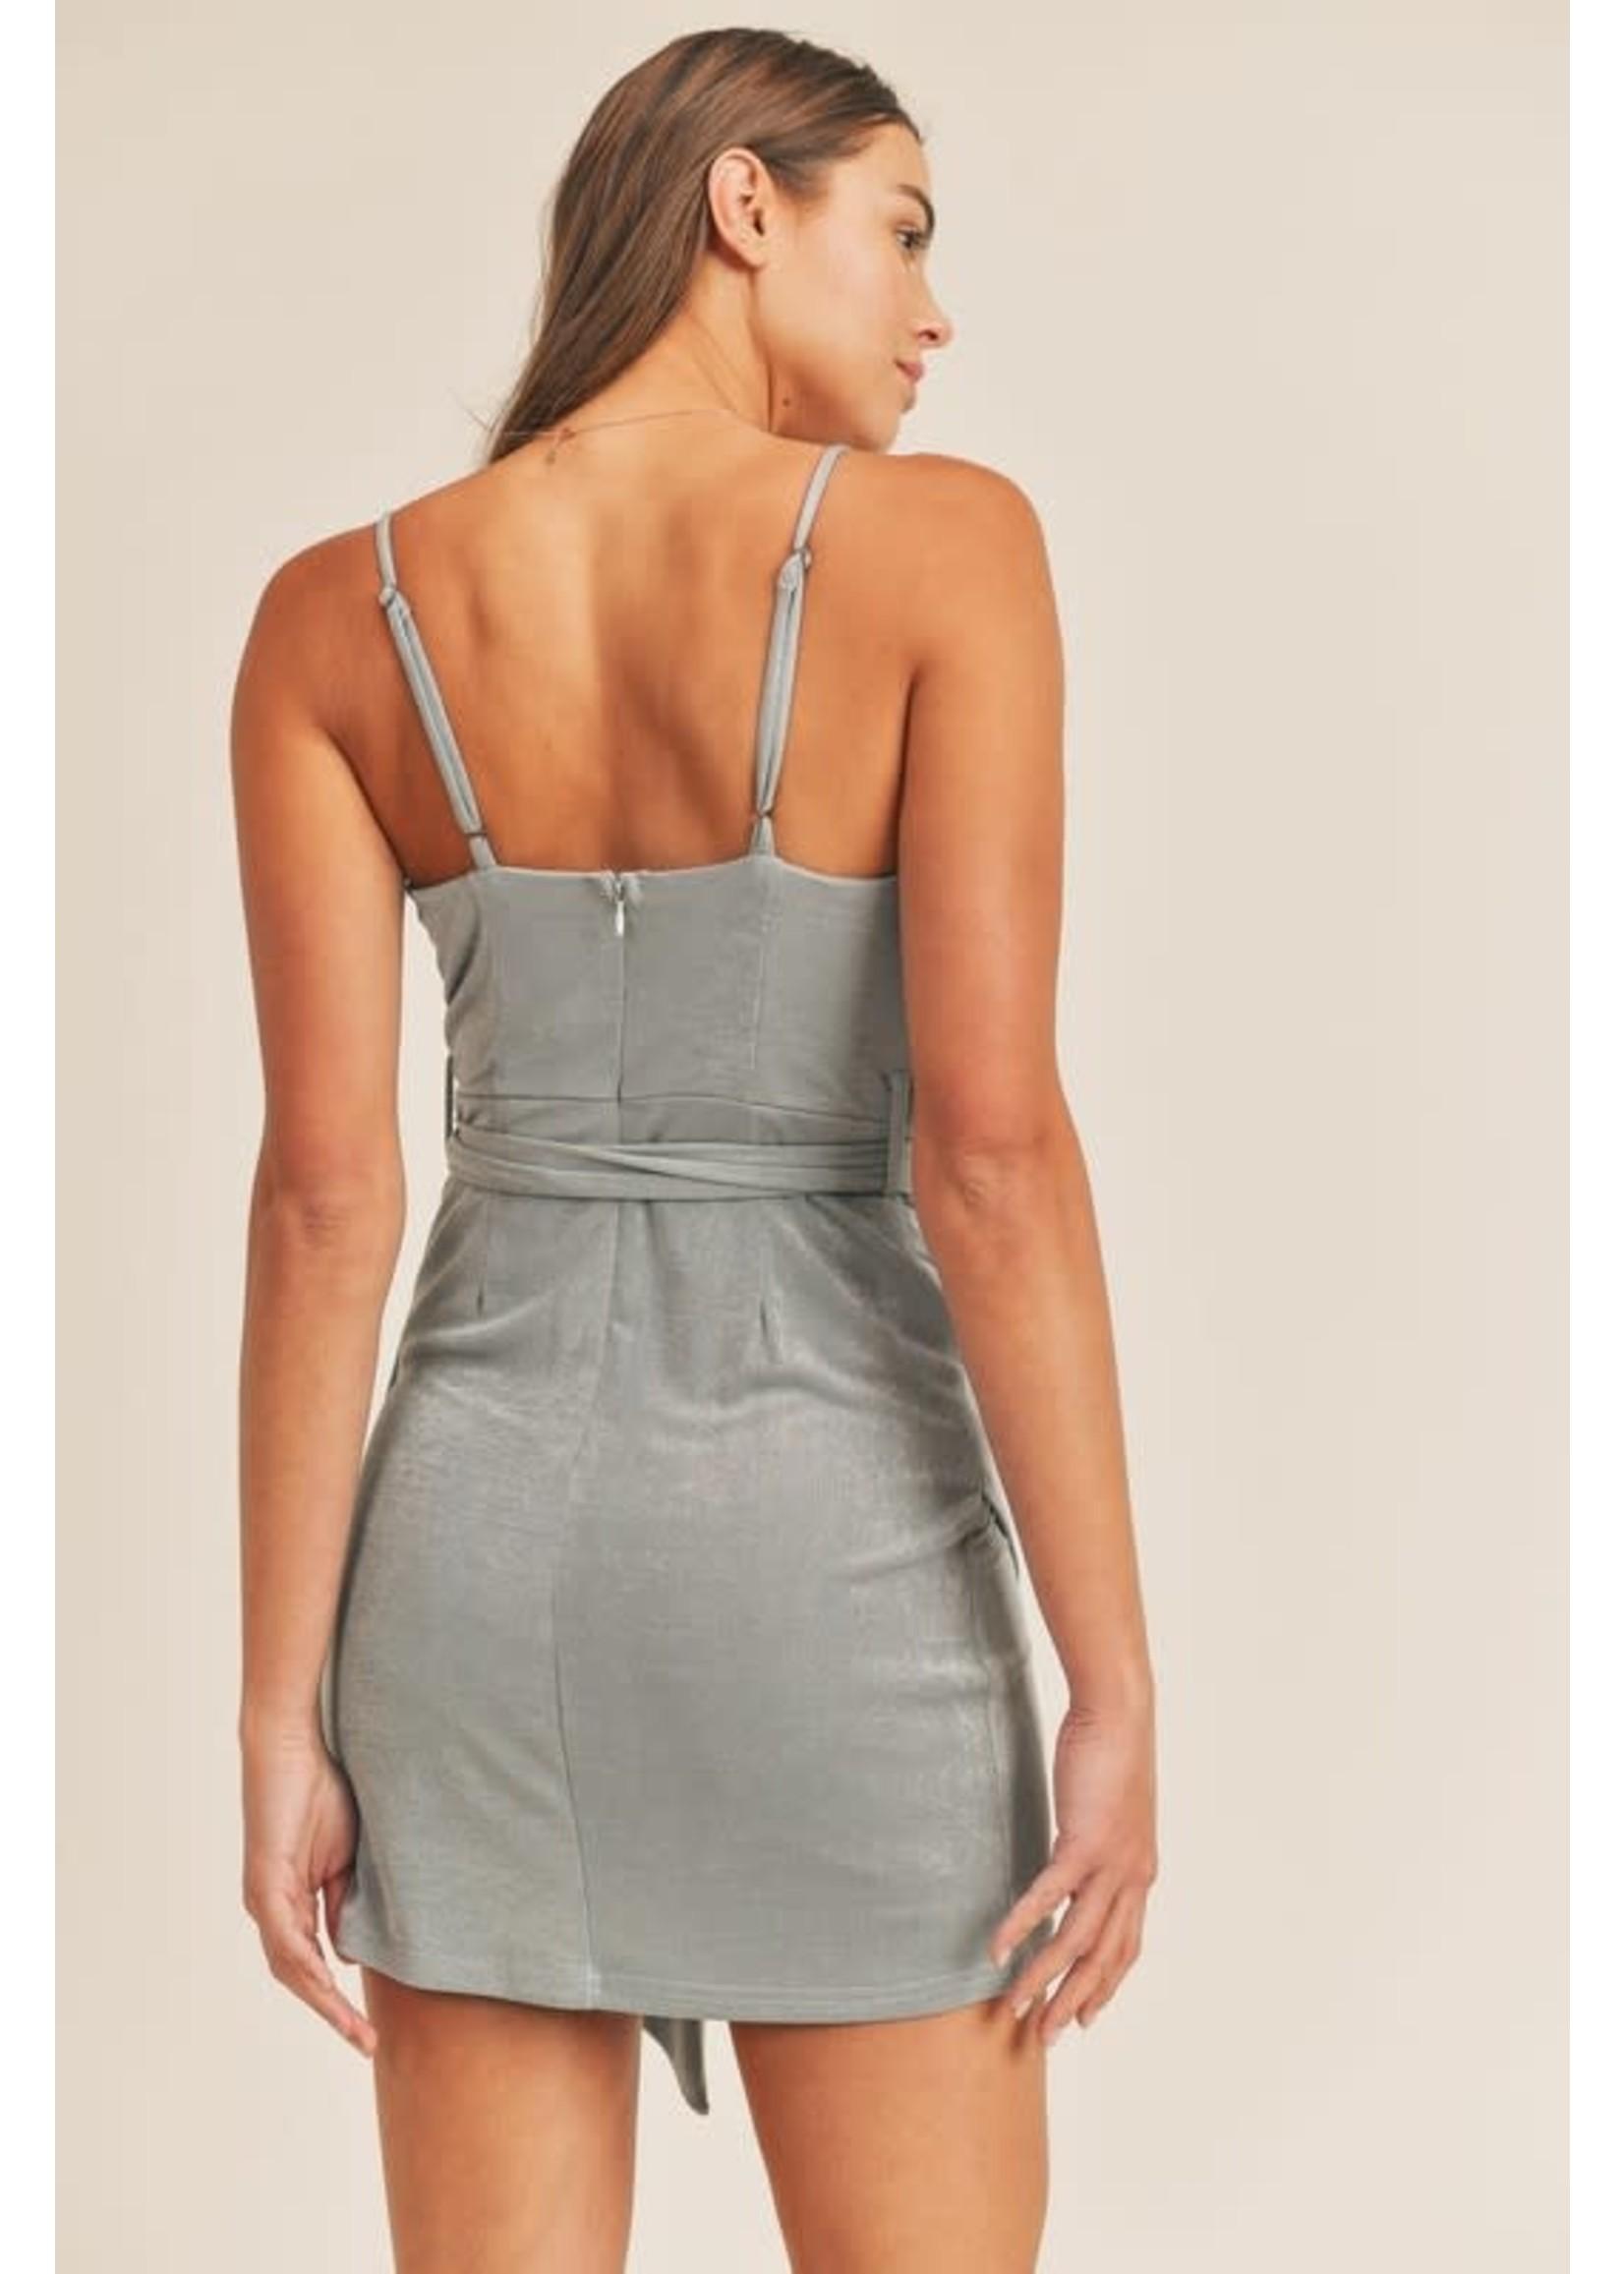 Mable Cowl Neck Bodycon Slinky Mini Dress - MD2584